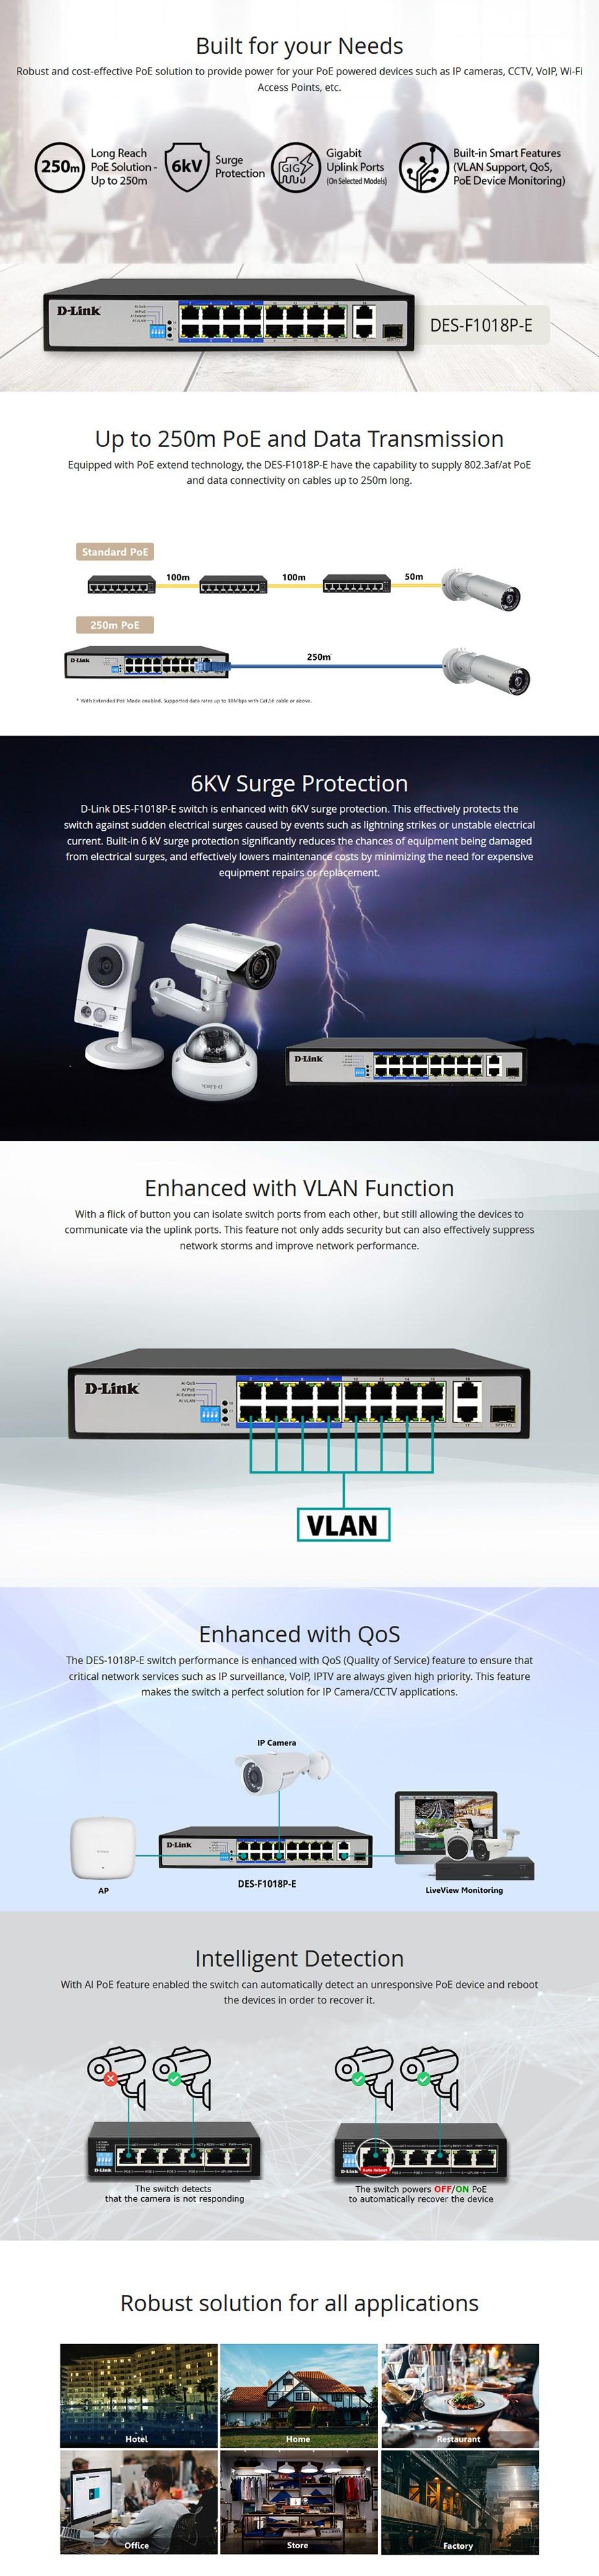 dlink-desf1018pe-18port-poe-switch-with-16-poe-ports2-gigabit-uplink-ports-ac35048-4.jpg